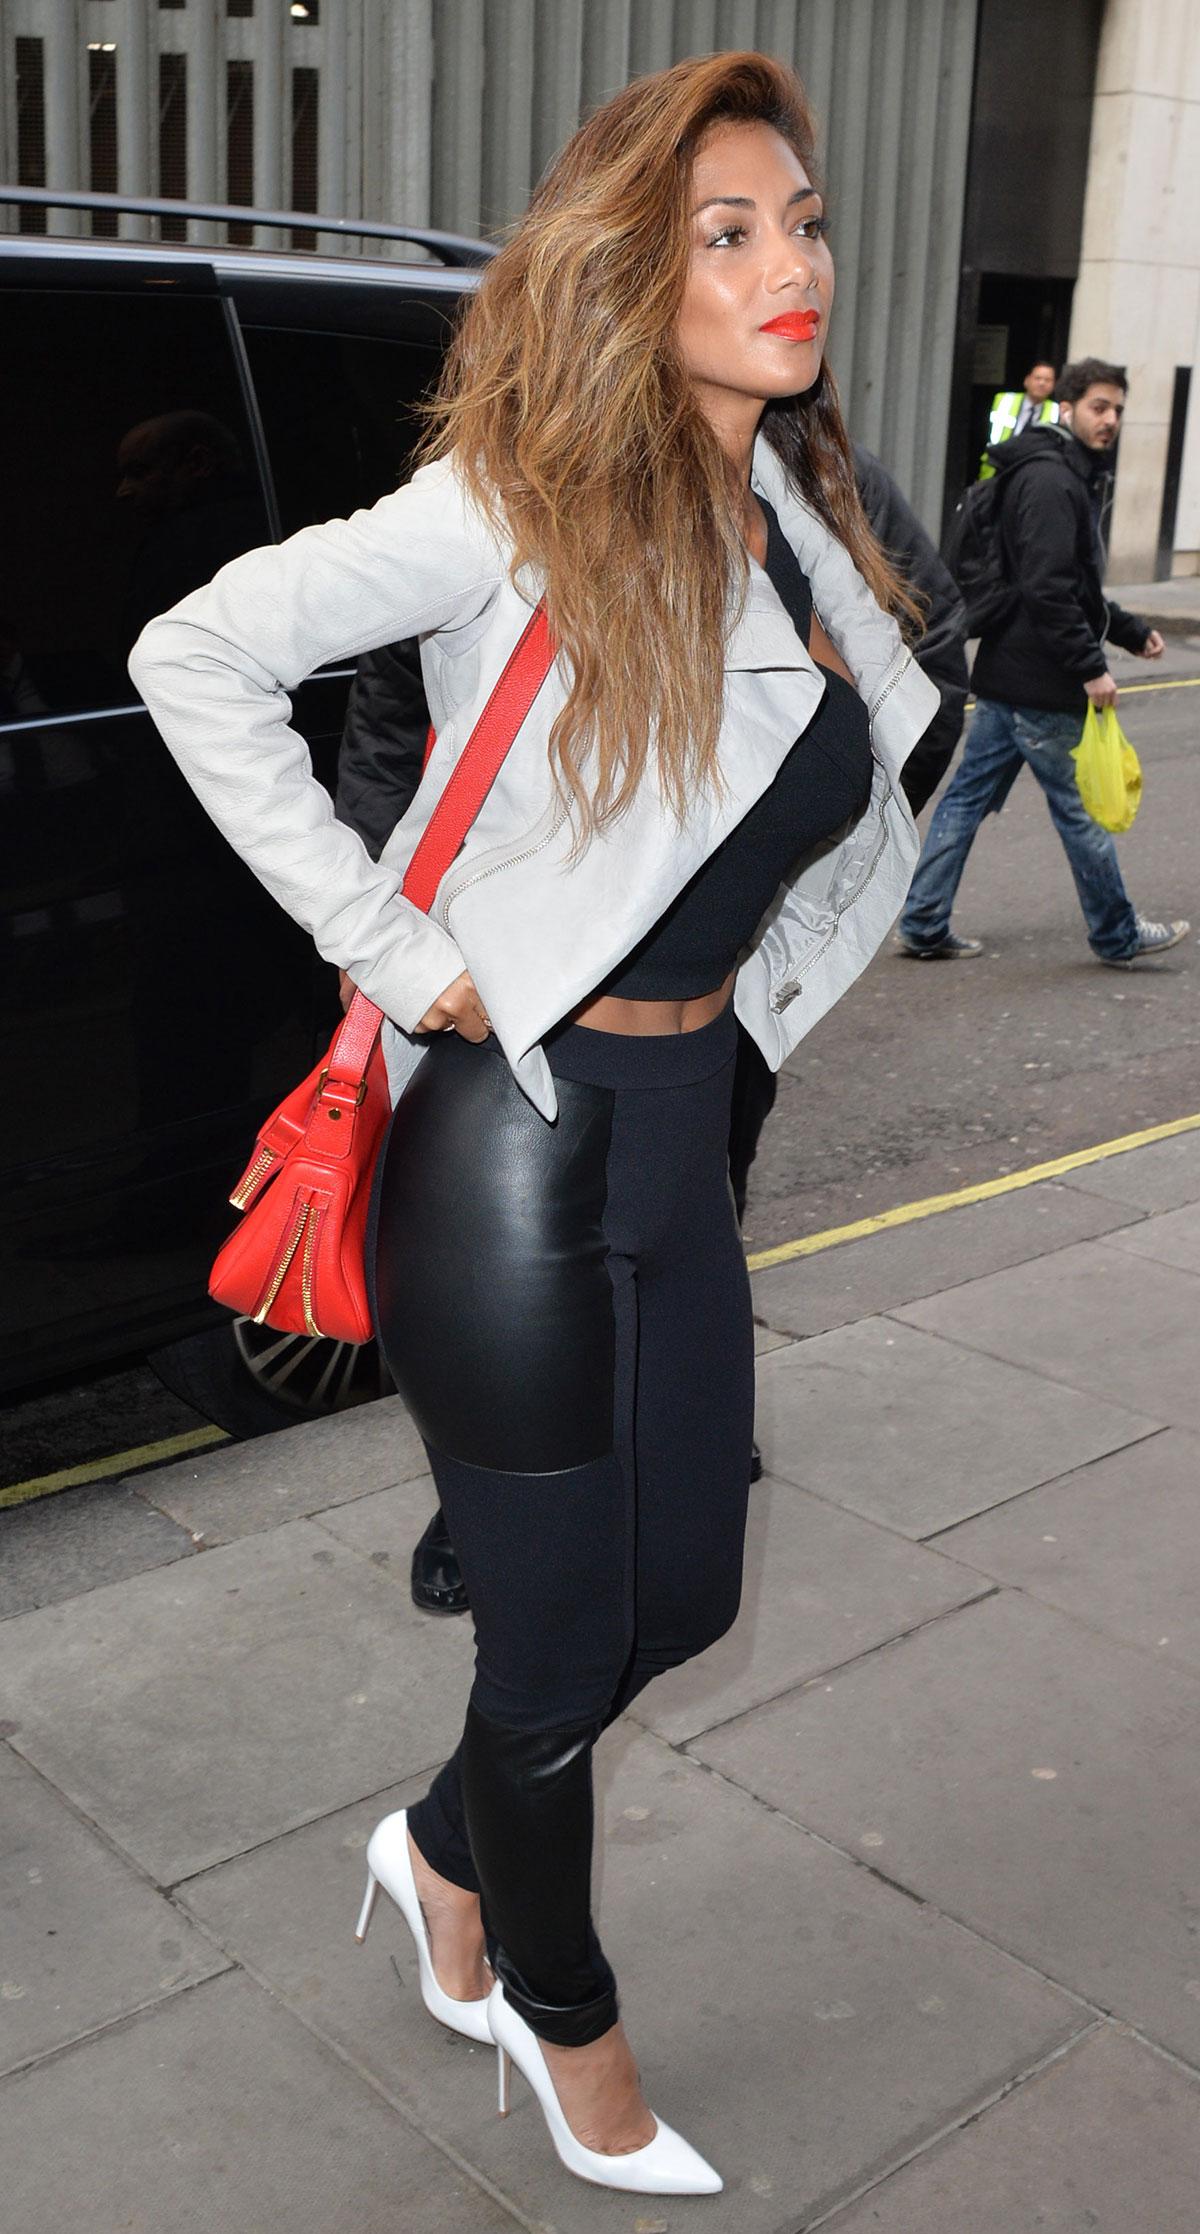 Nicole Scherzinger at KISS FM Radio Station